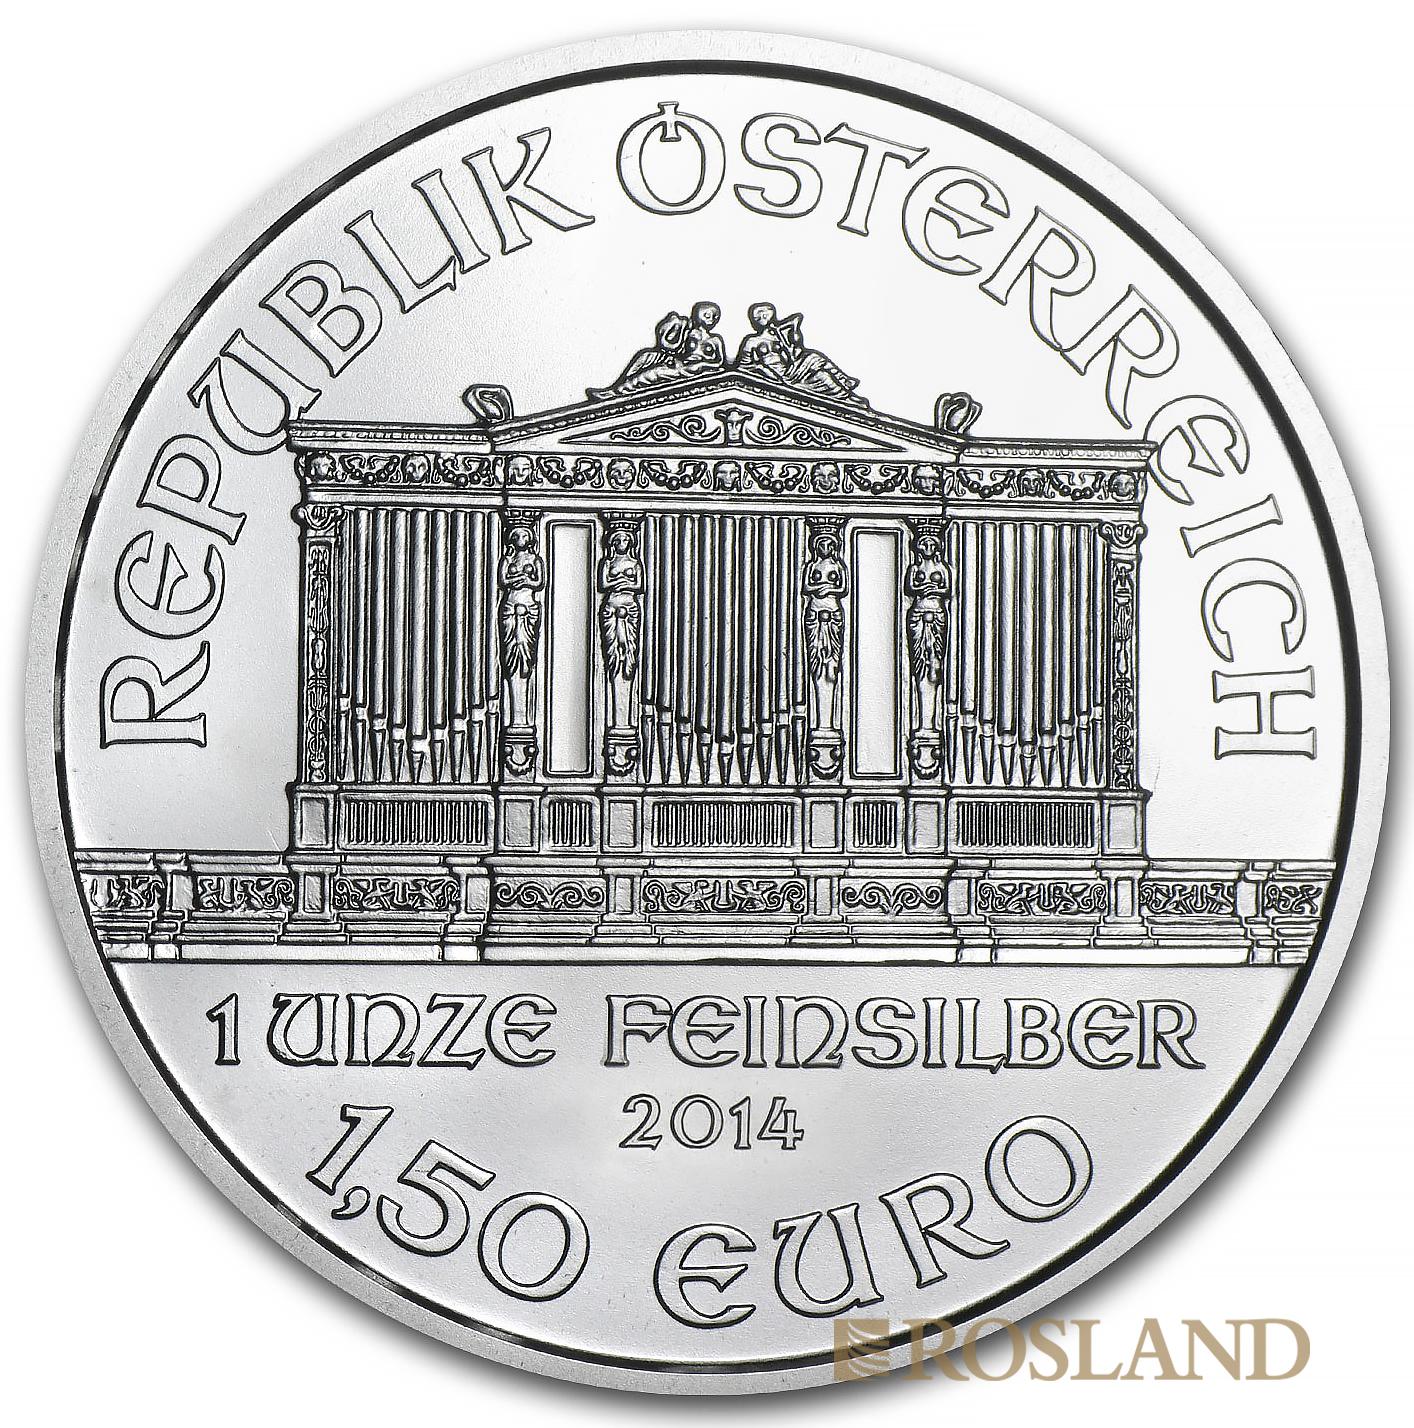 1 Unze Silbermünze Wiener Philharmoniker 2014